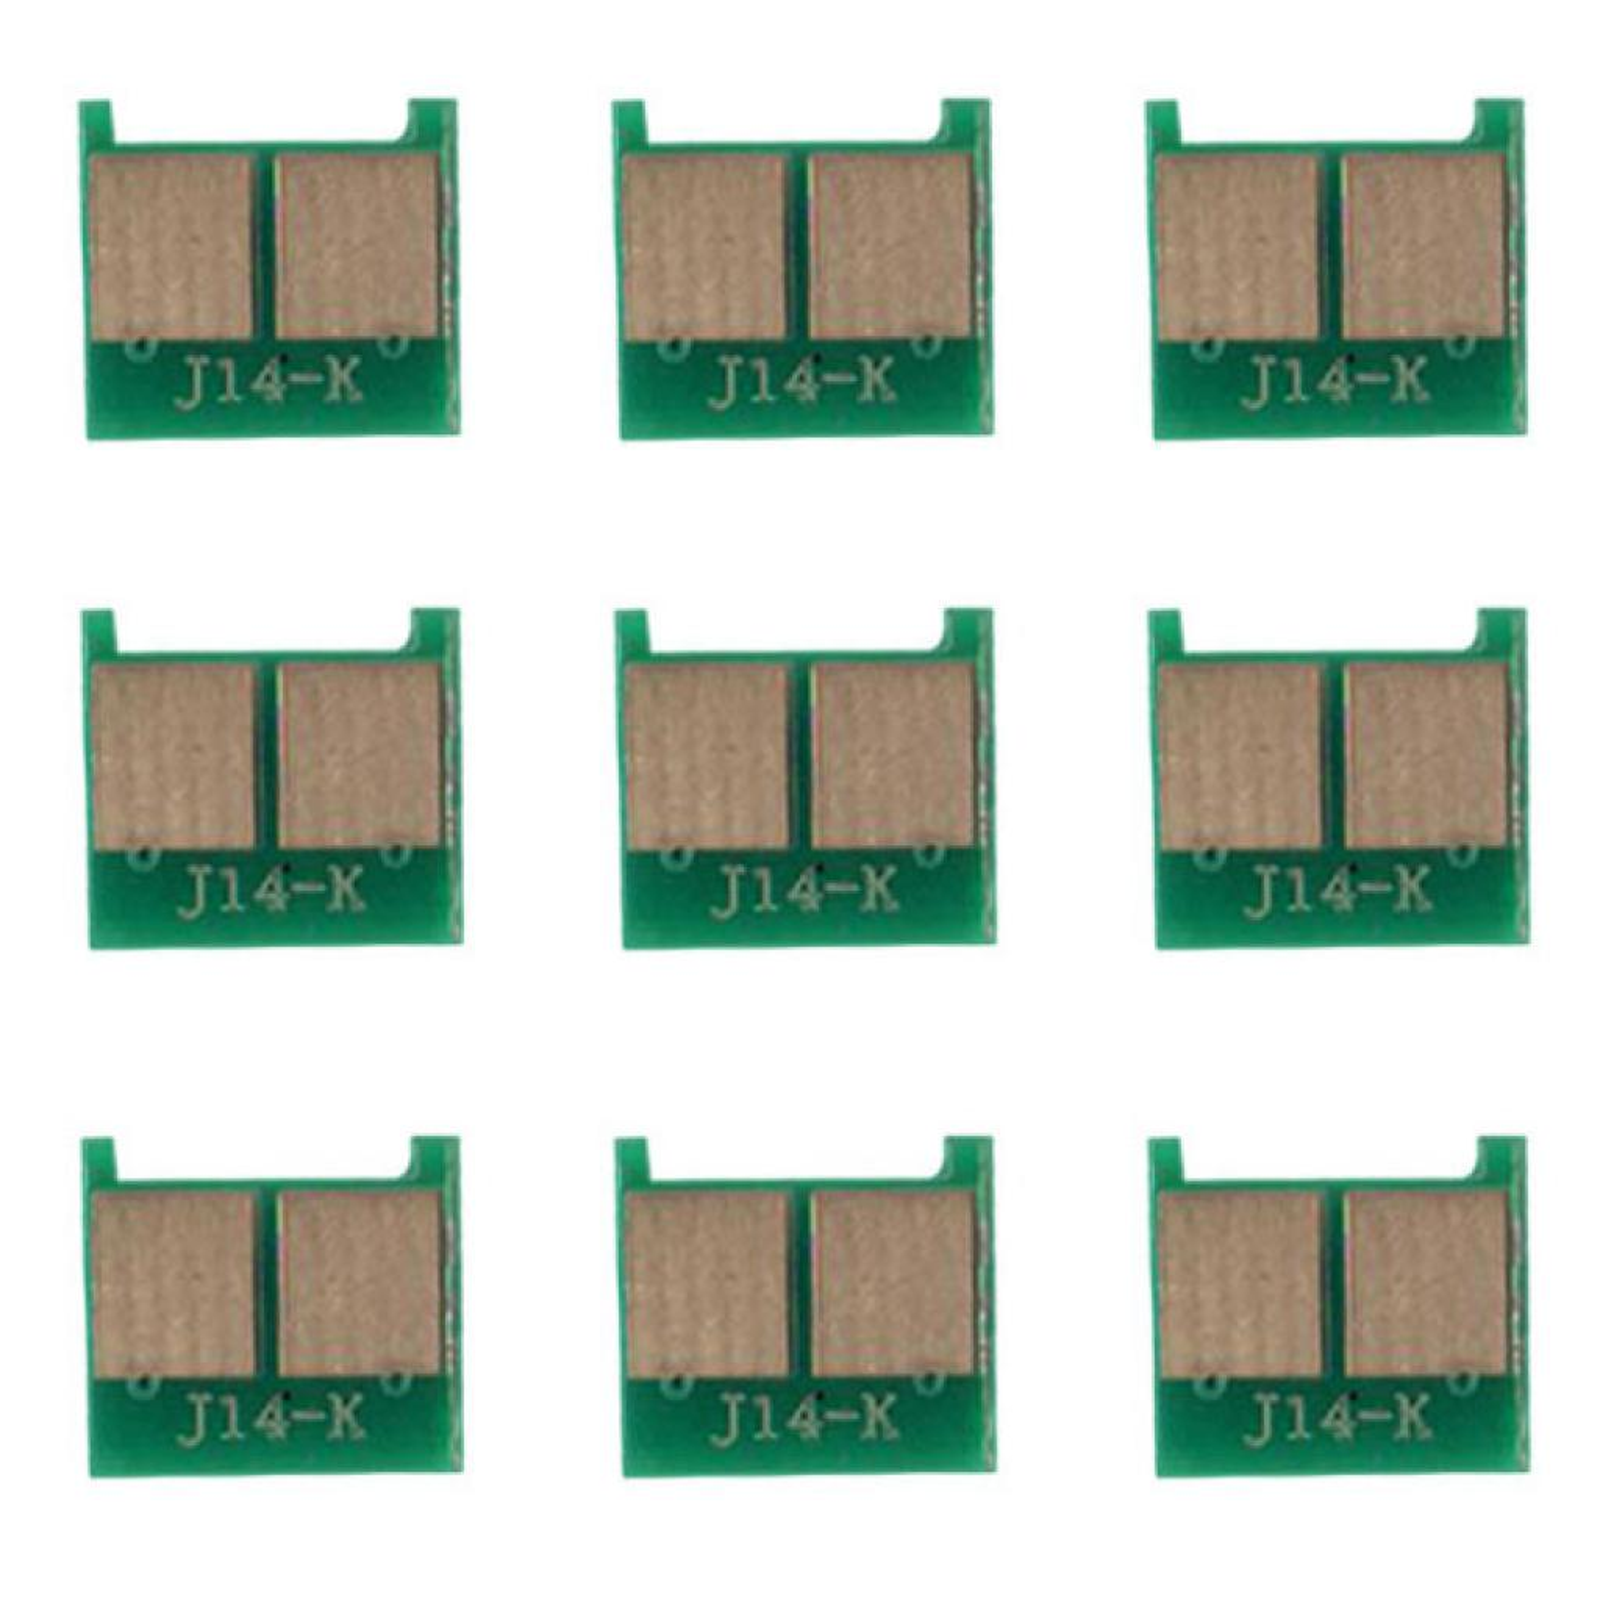 Чип для картриджа HP CLJ Pro 700/M176/177/775/CM4540/CP5520/5525 Magenta AHK (1800413)